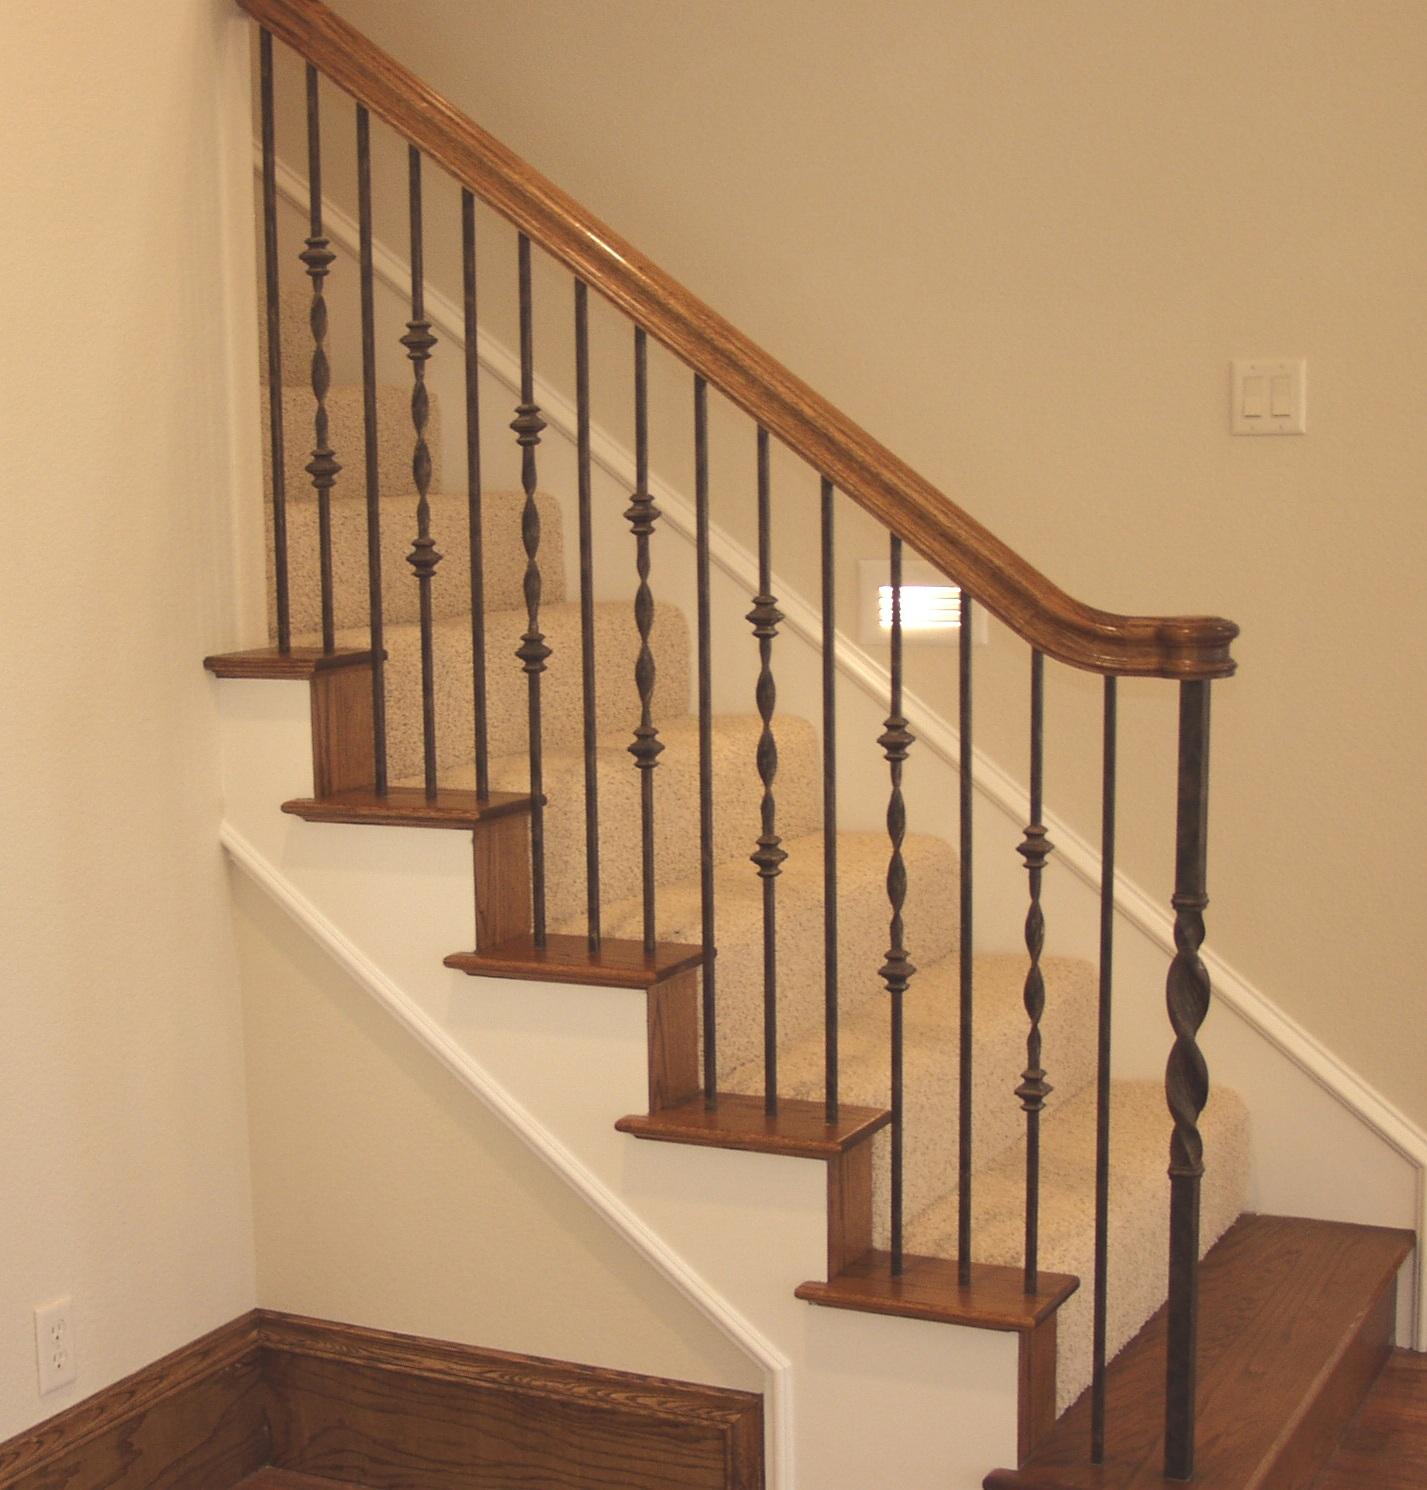 Master Fabrication Wrought Iron Staircase Design Center